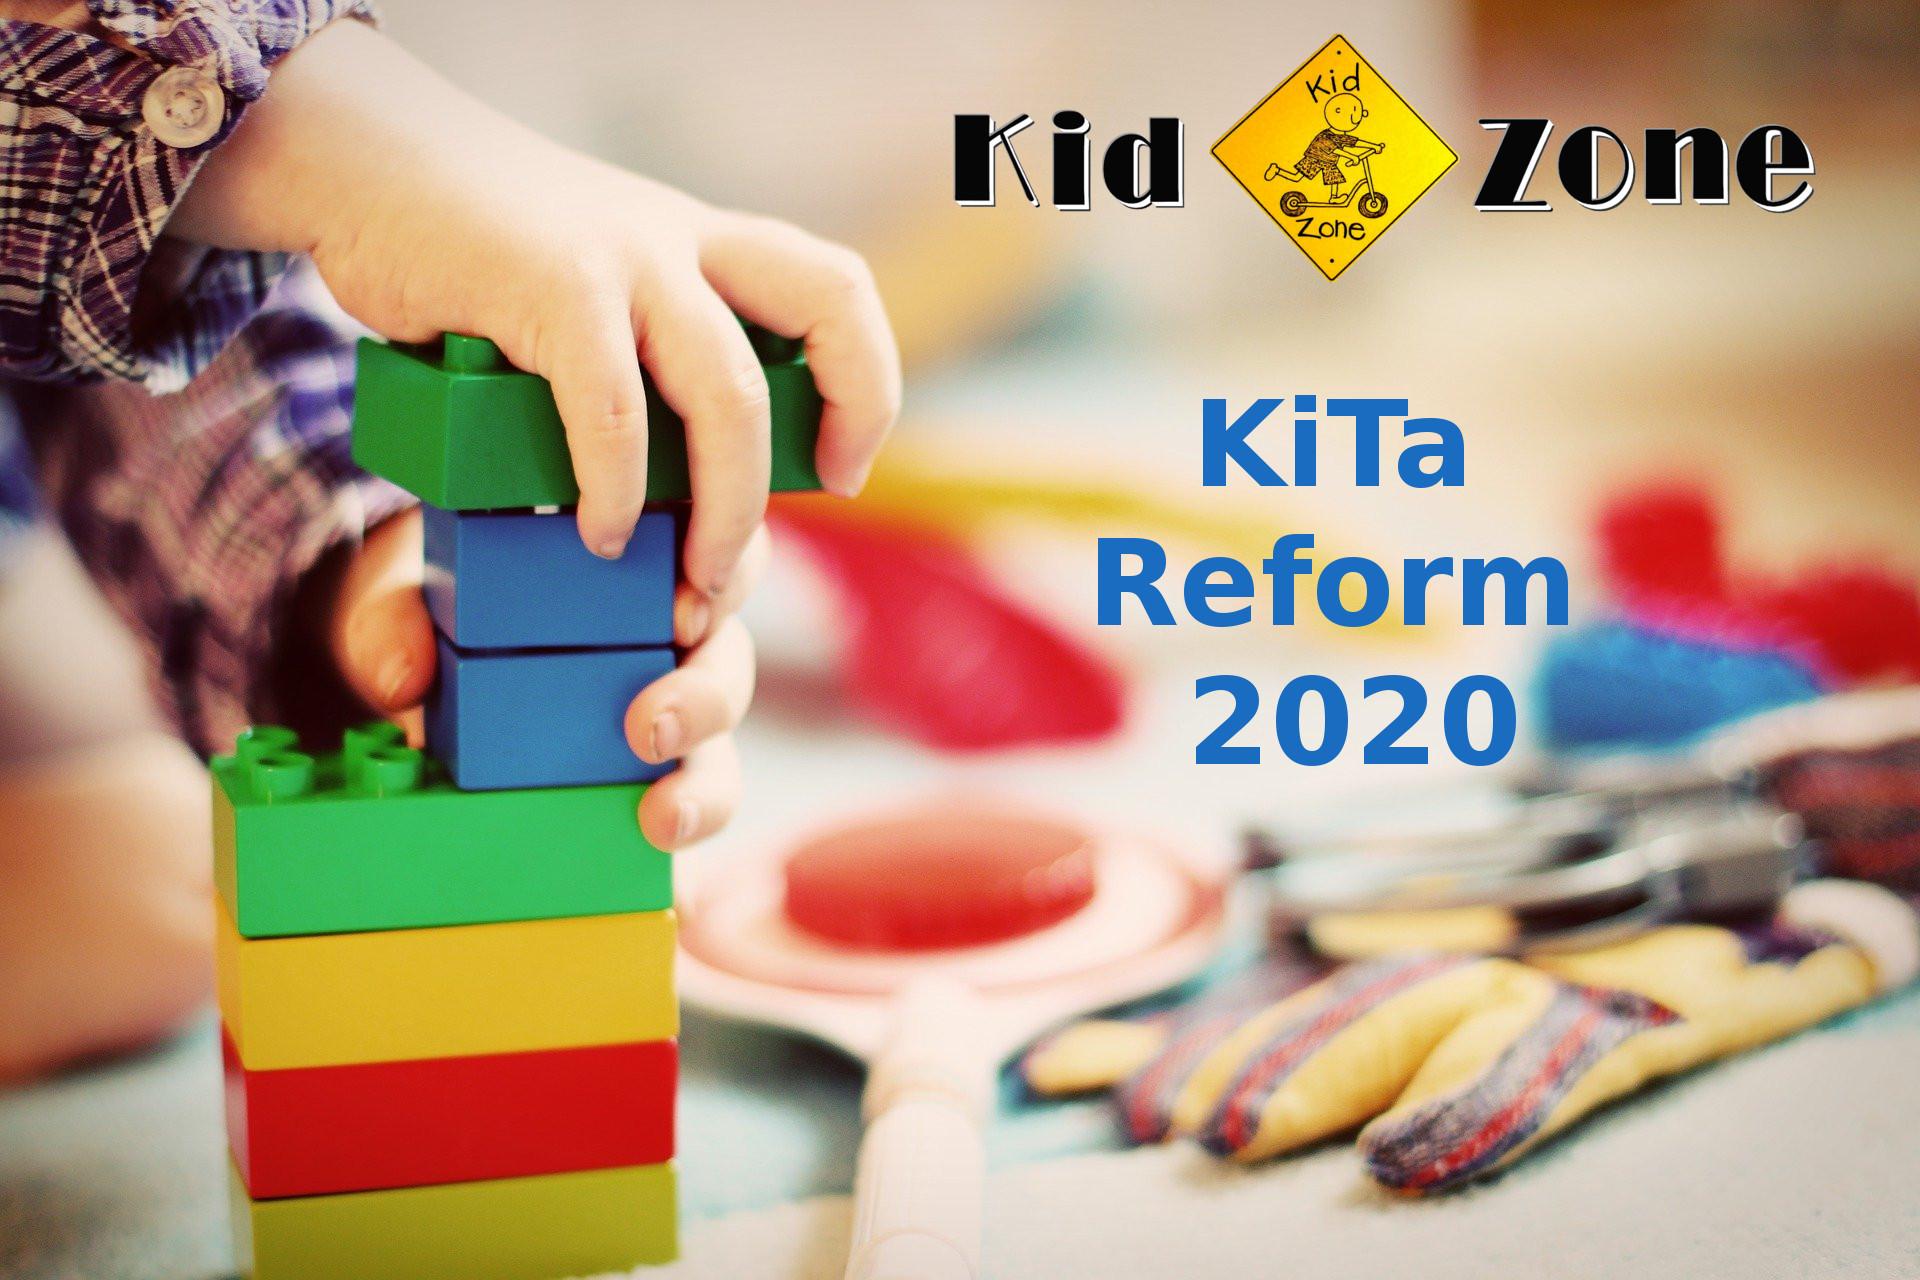 Kita Reform 2020 Kitaplatz 288 Euro pro Monat 40 stunden - Kid Zone Neuigkeiten und Aktionen